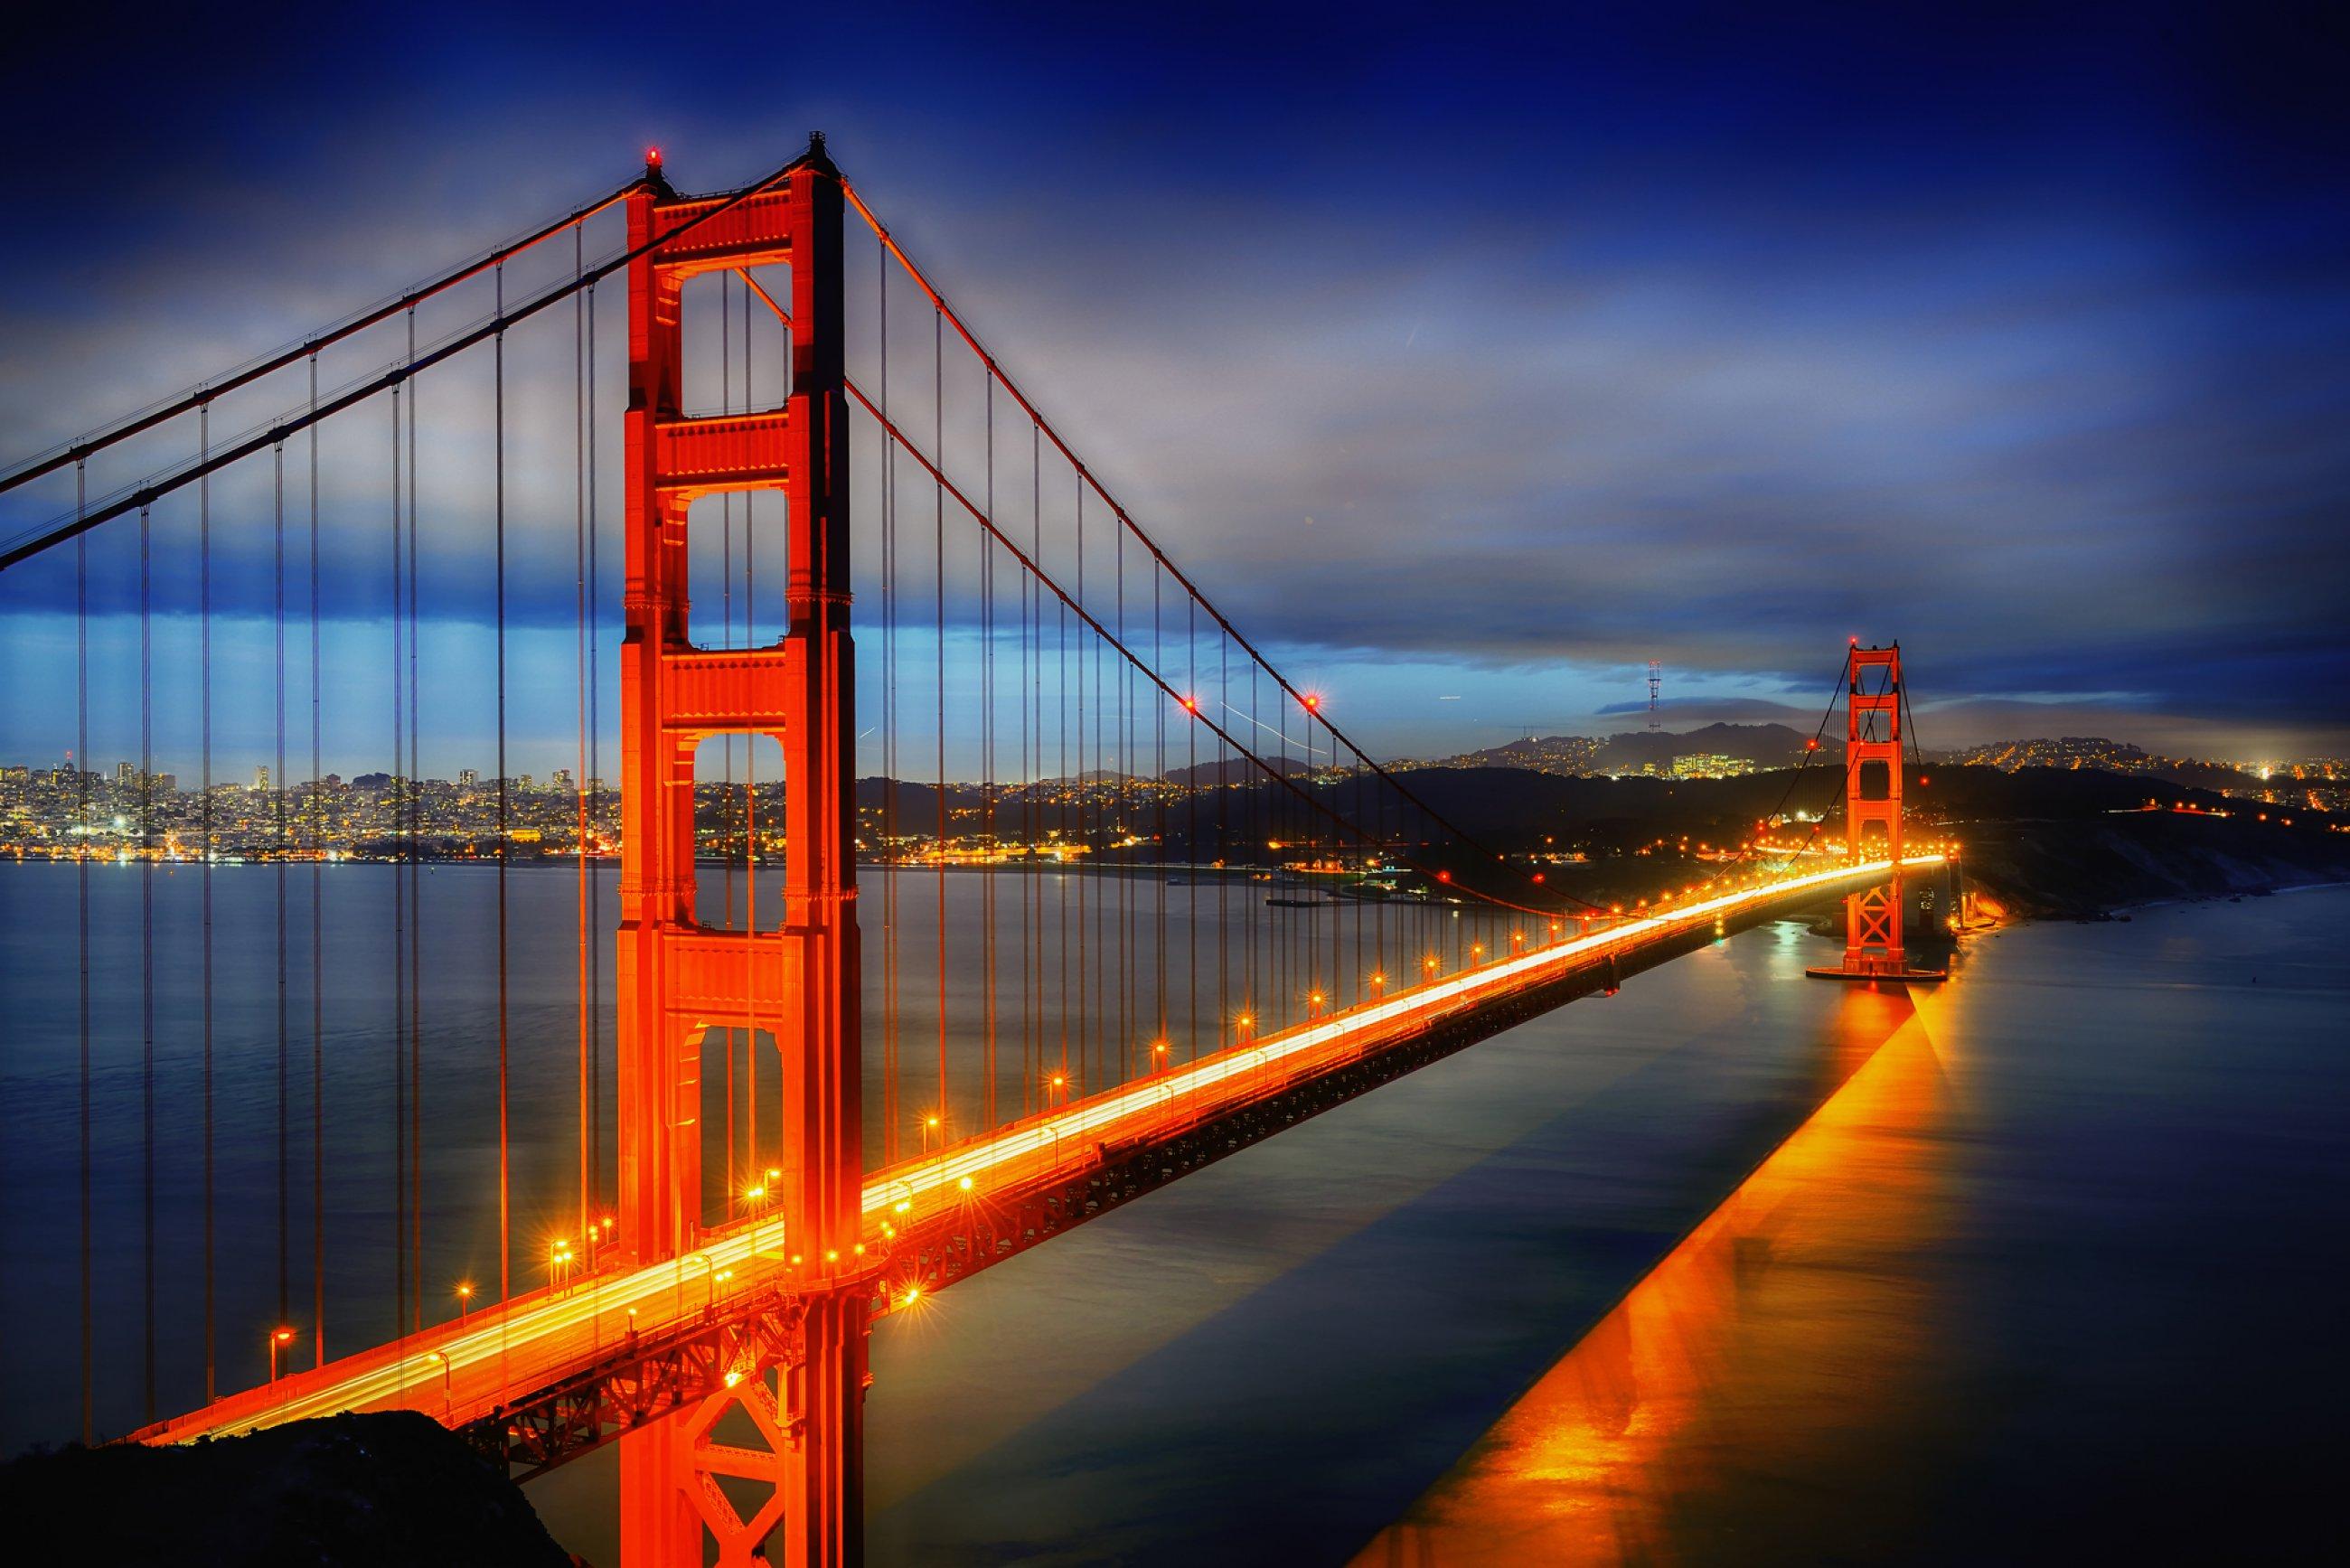 https://bubo.sk/uploads/galleries/4997/sf-kalifornia-famous-golden-gate-bridge-san-francisco-at-night-usa.jpg